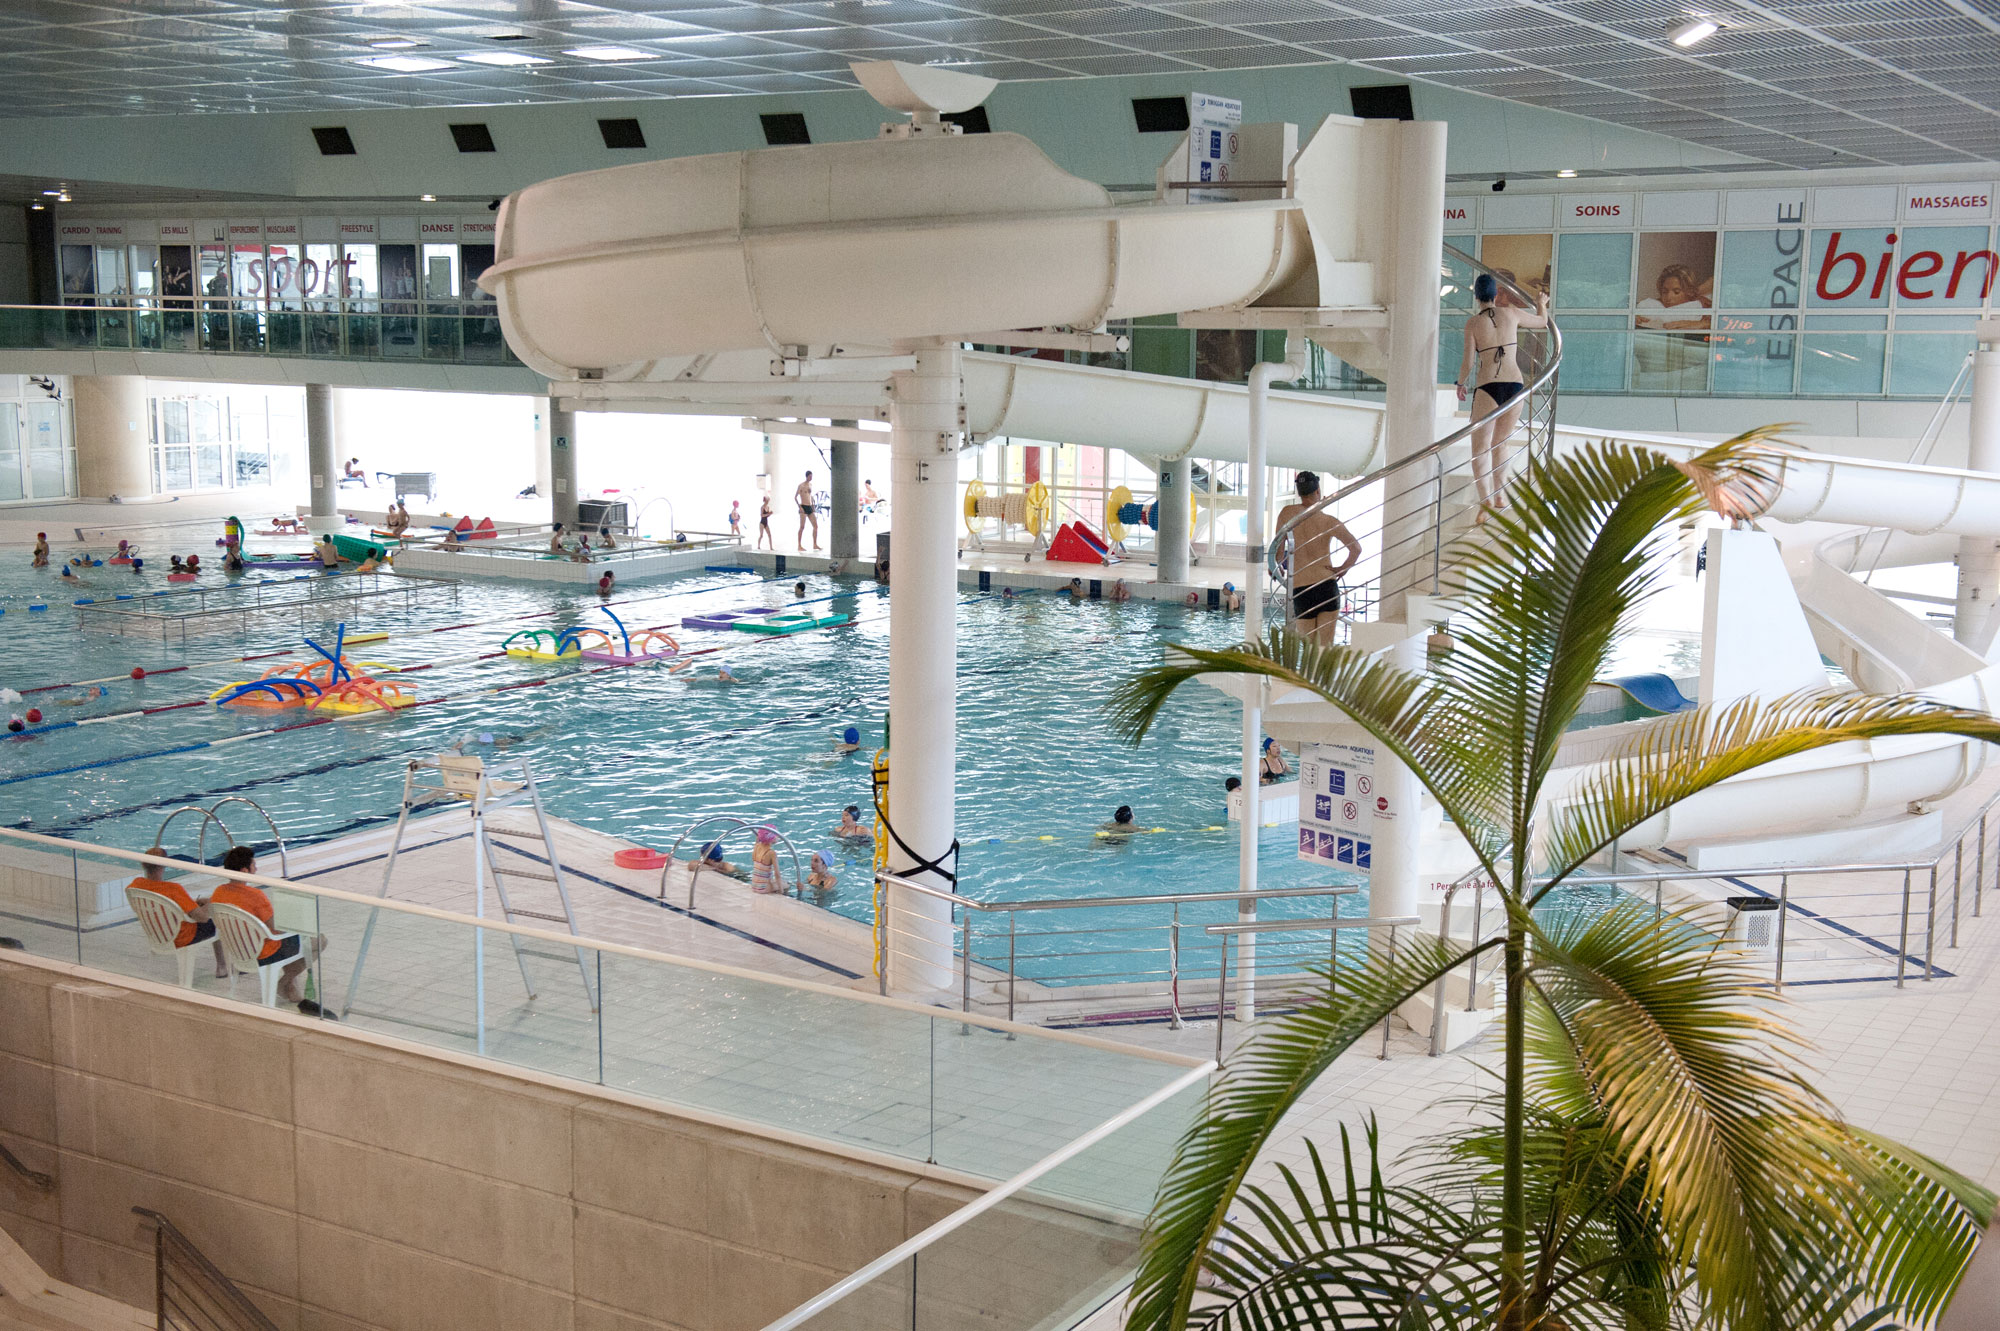 piscine olympique d 39 antigone montpellier m diterran e